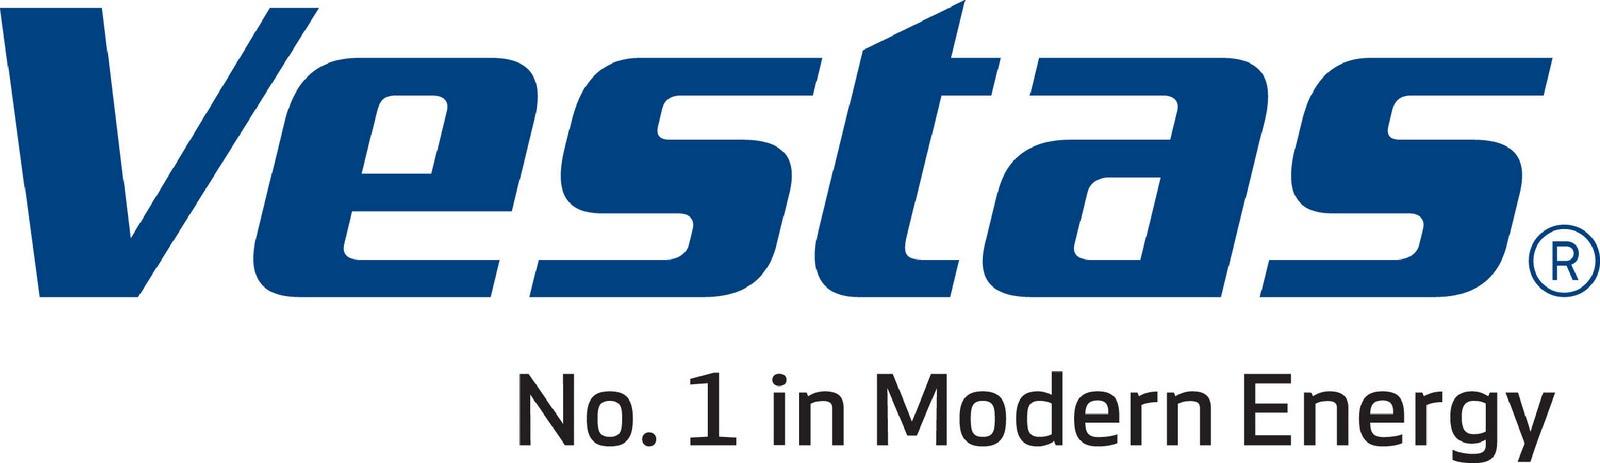 Vestas Wind Systems AS